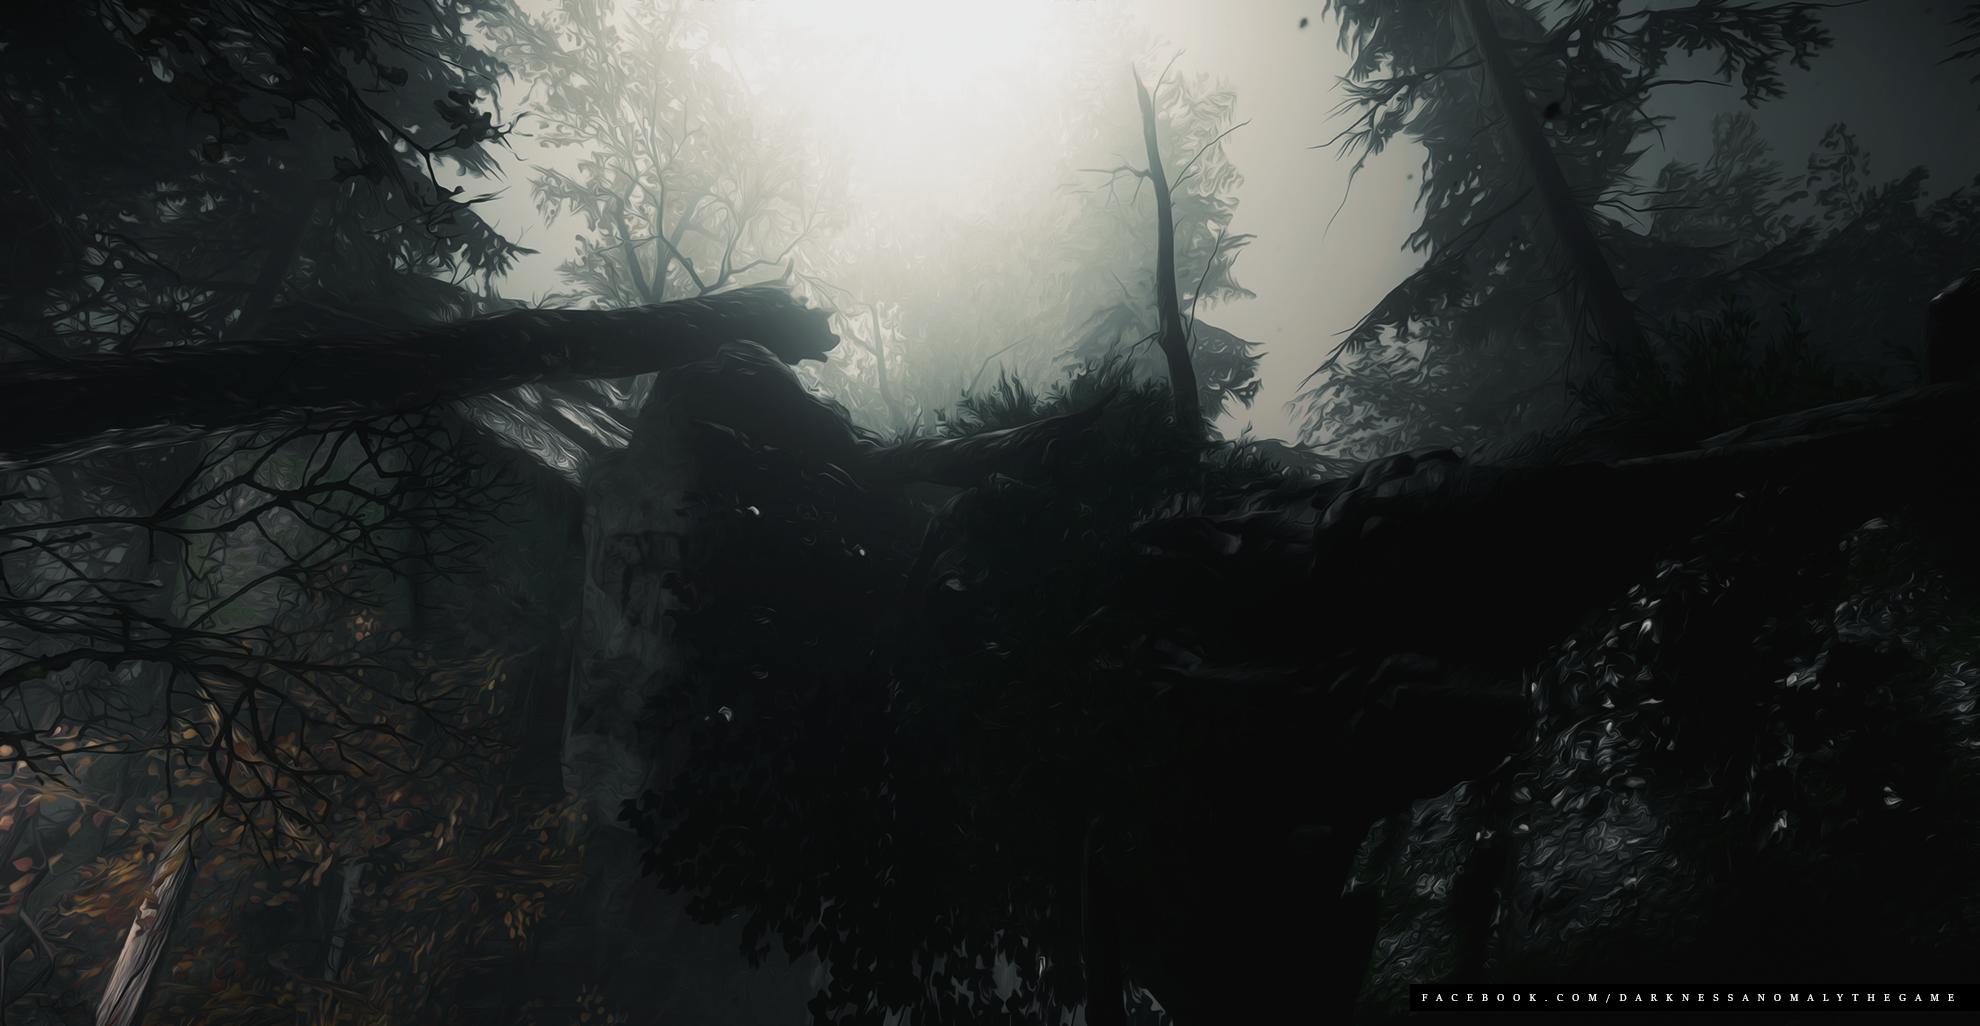 Woods2Facebook